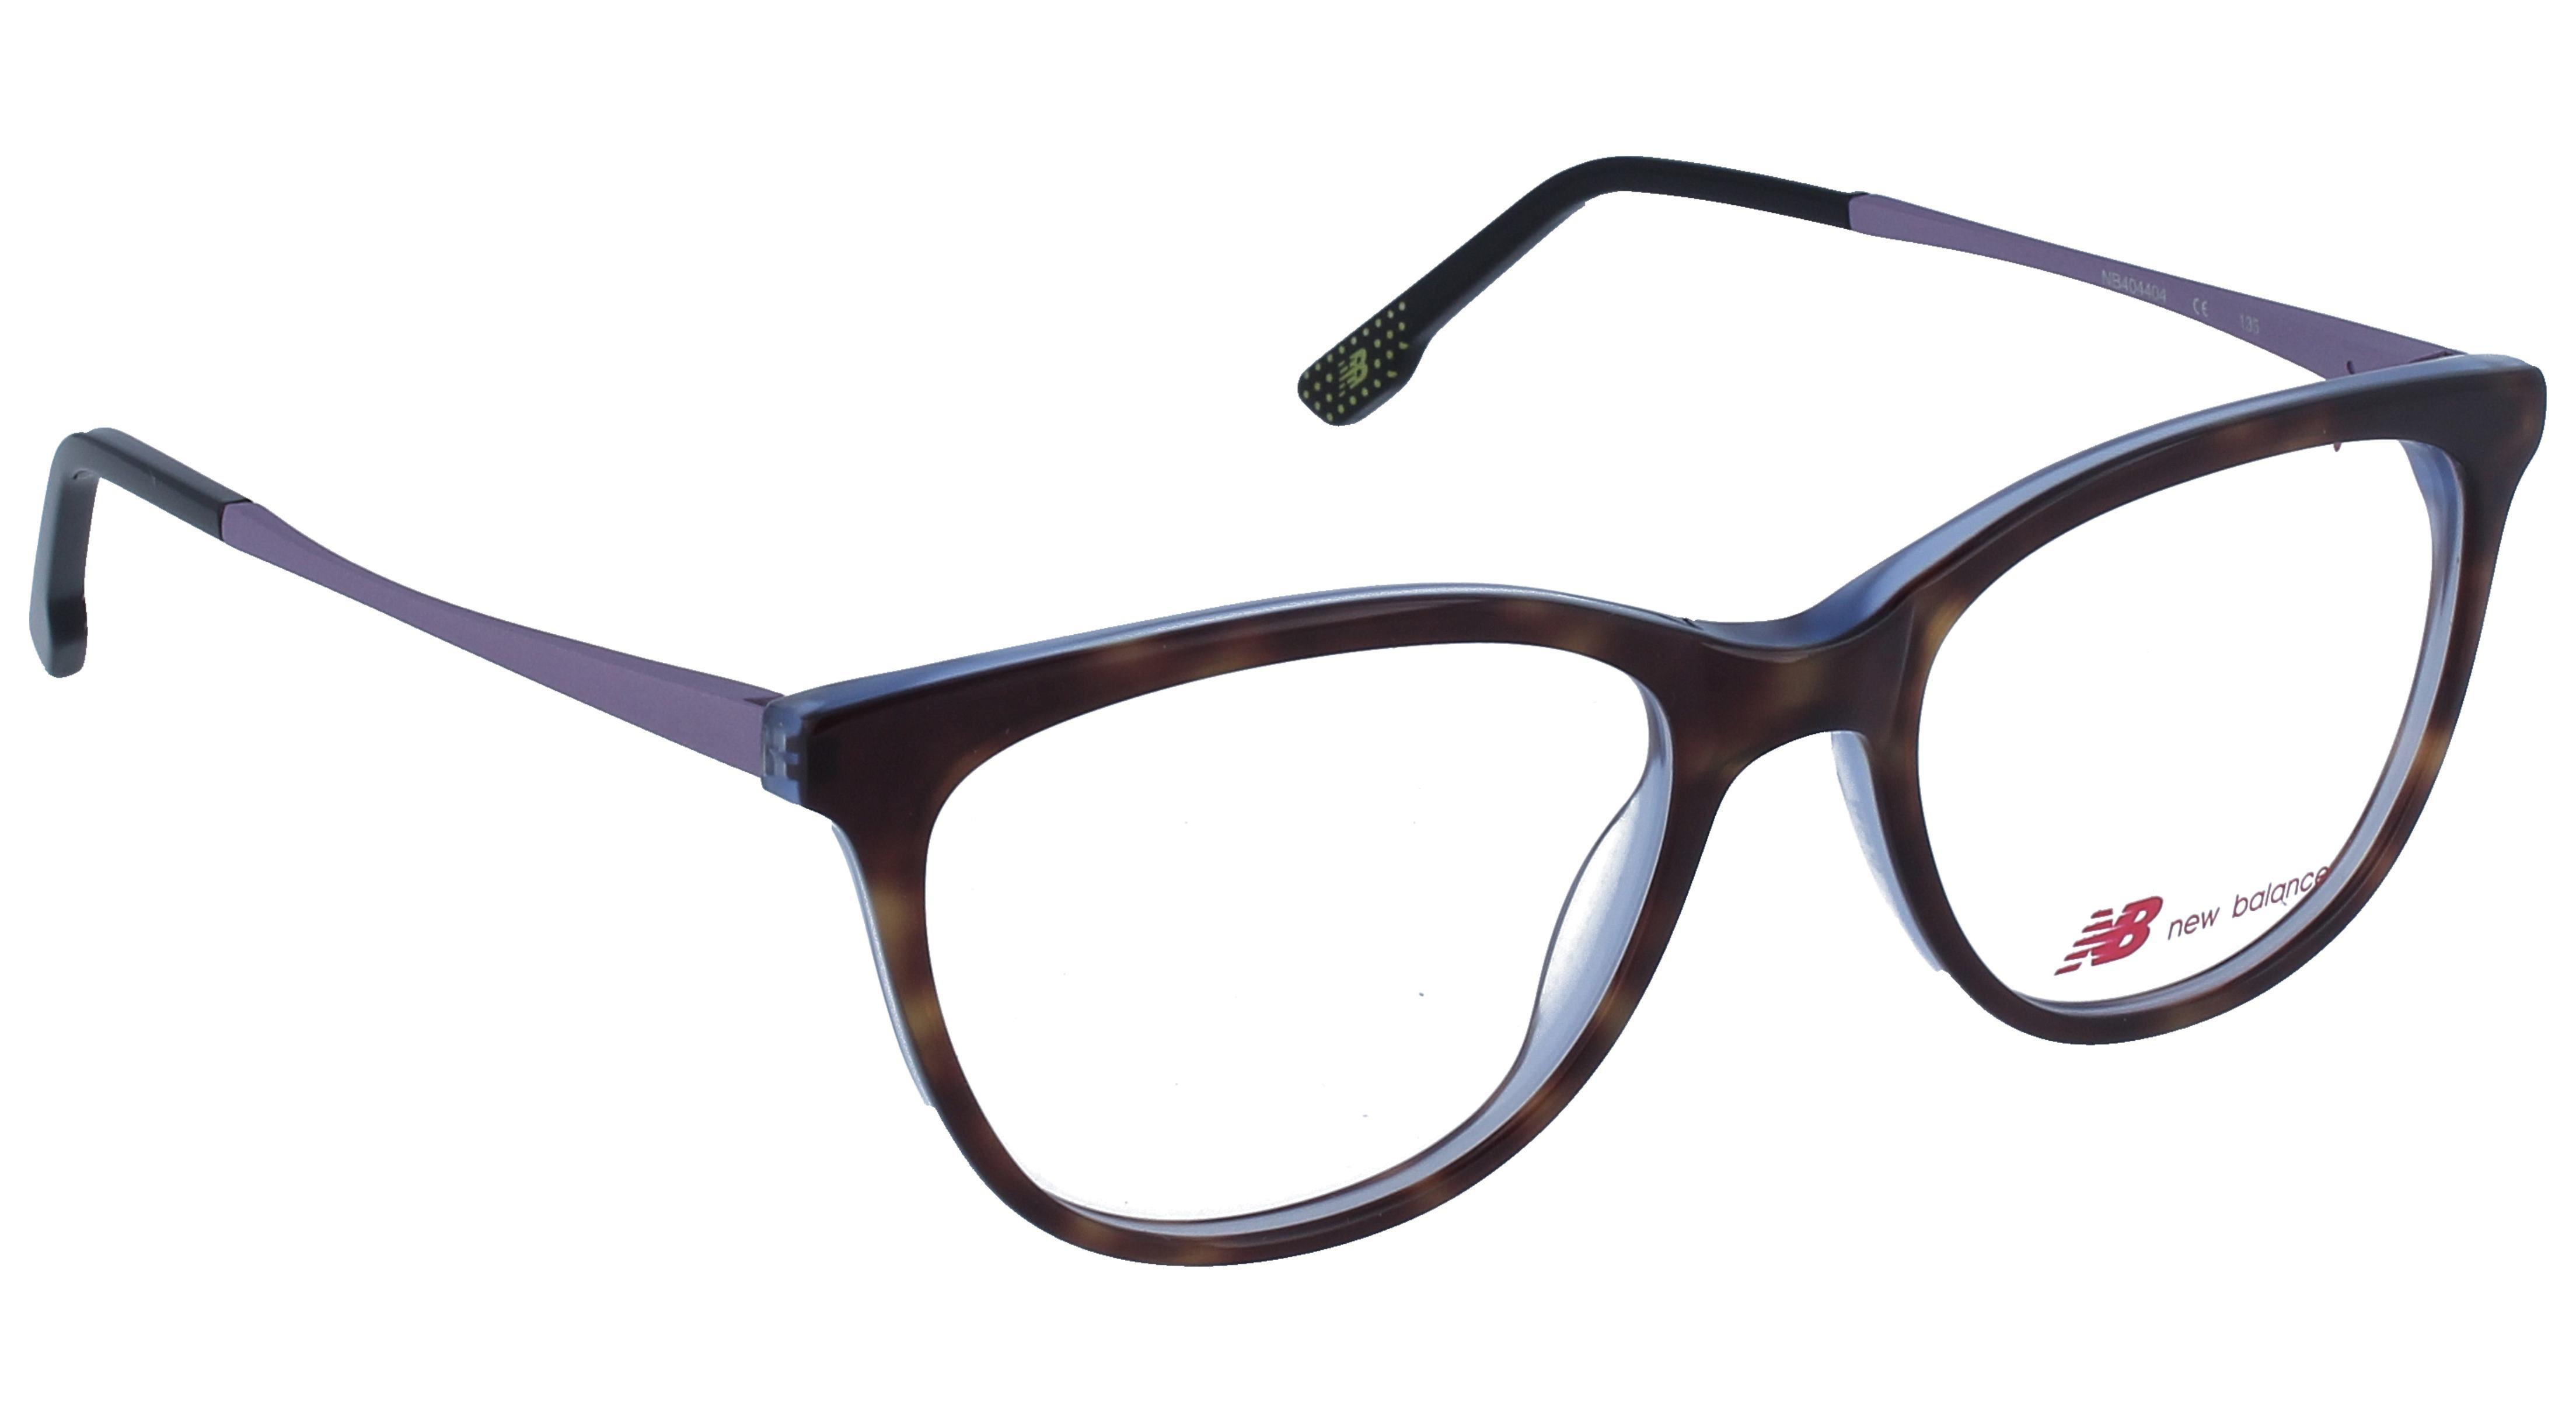 New Balance 4044 4 51 17 Eyeglasses